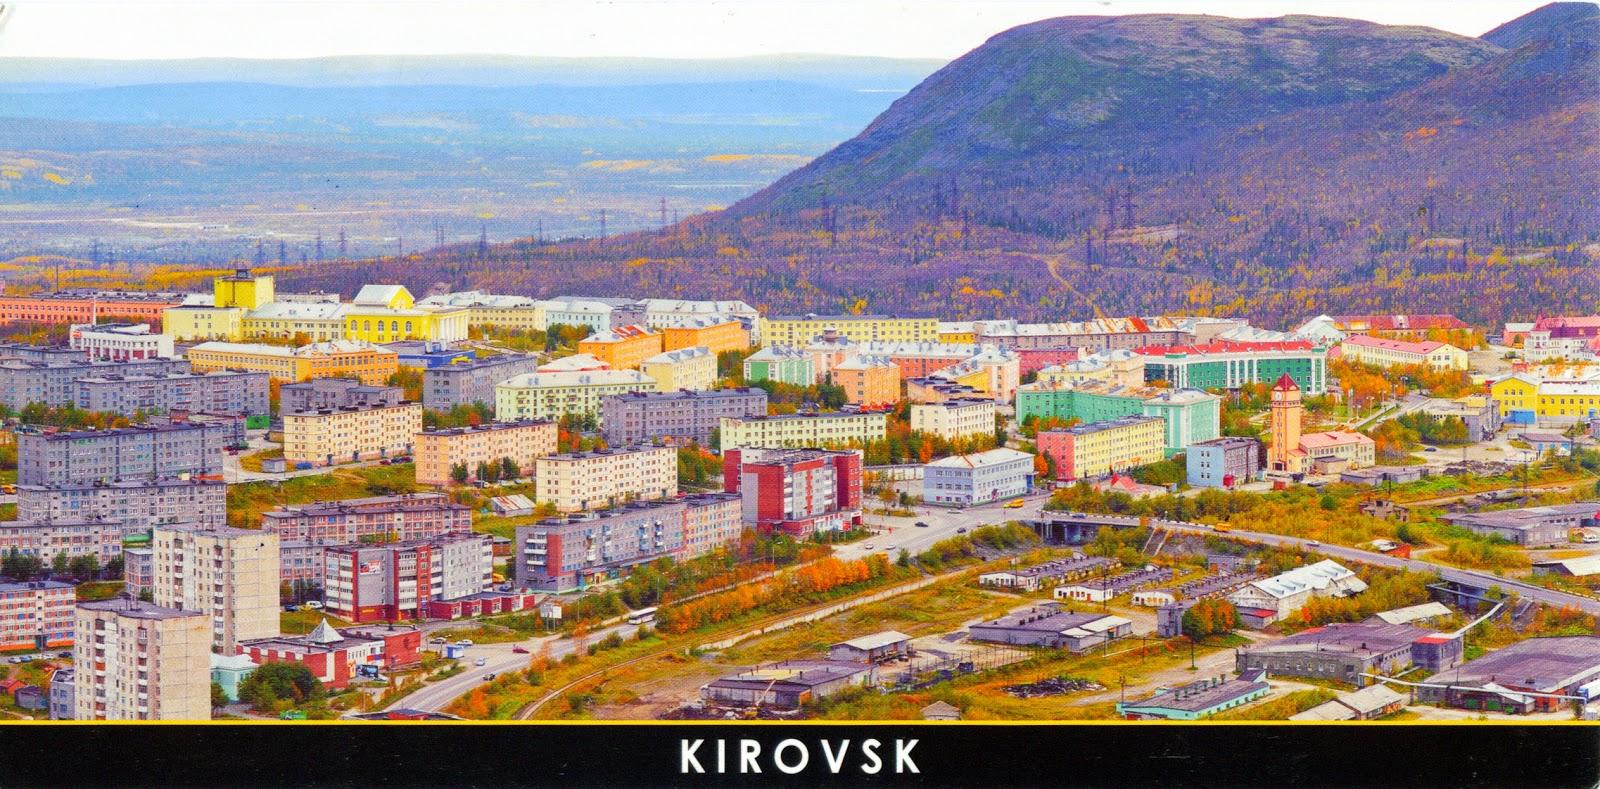 WORLD, COME TO MY HOME!: 1307 RUSSIA (Murmansk Oblast